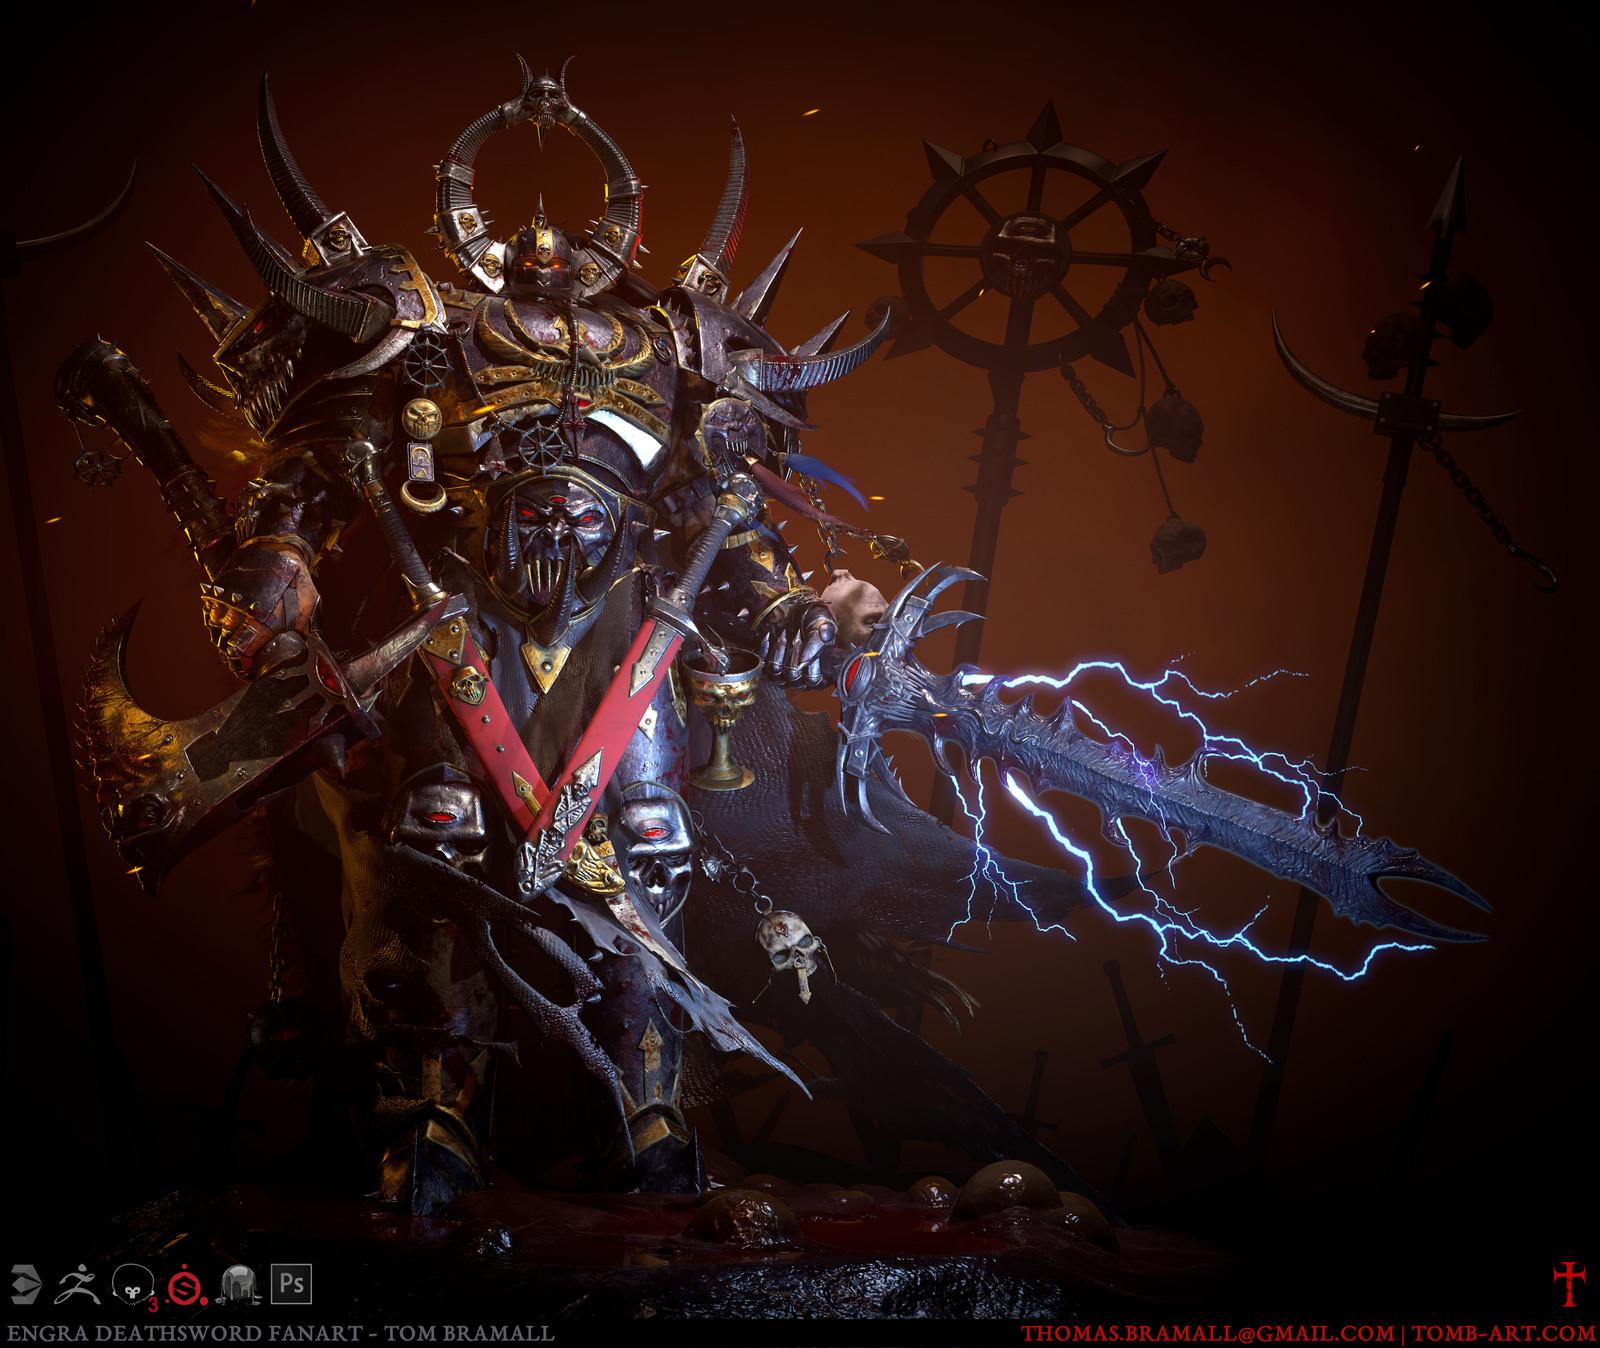 Engra Deathsword [Warhammer Fanart]